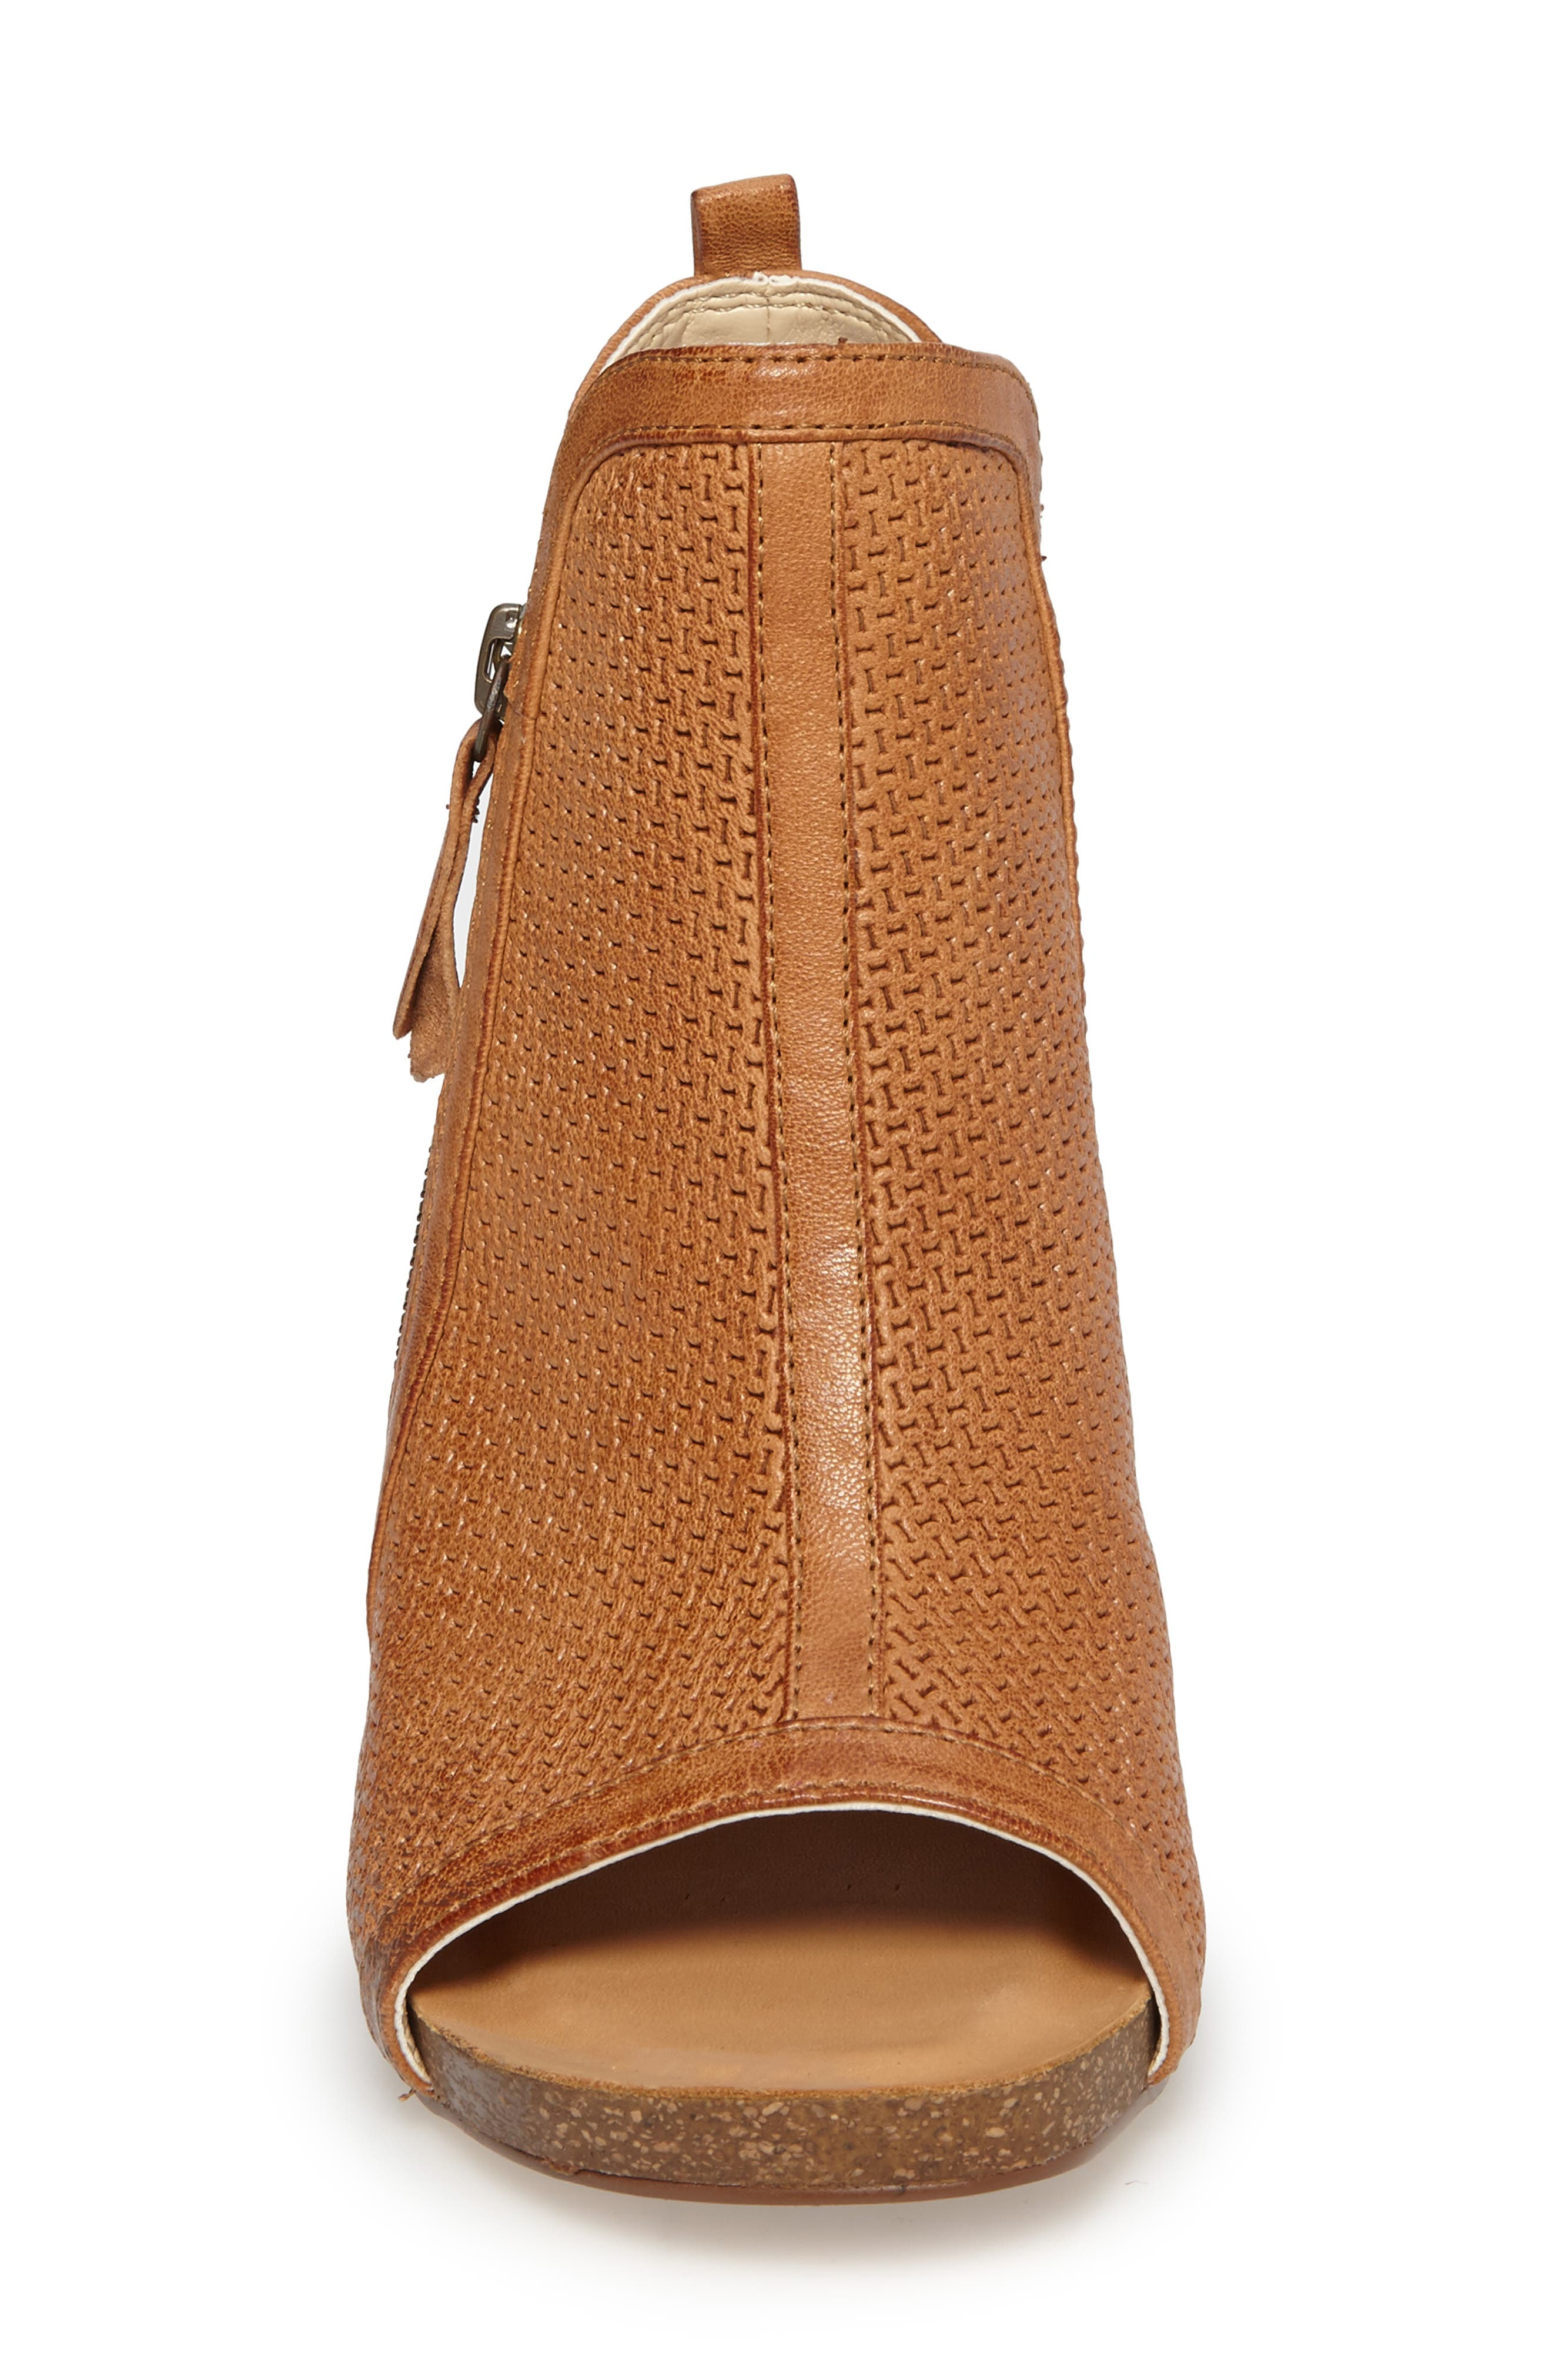 Iliana Open Toe Bootie,                             Alternate thumbnail 4, color,                             Luggage Leather